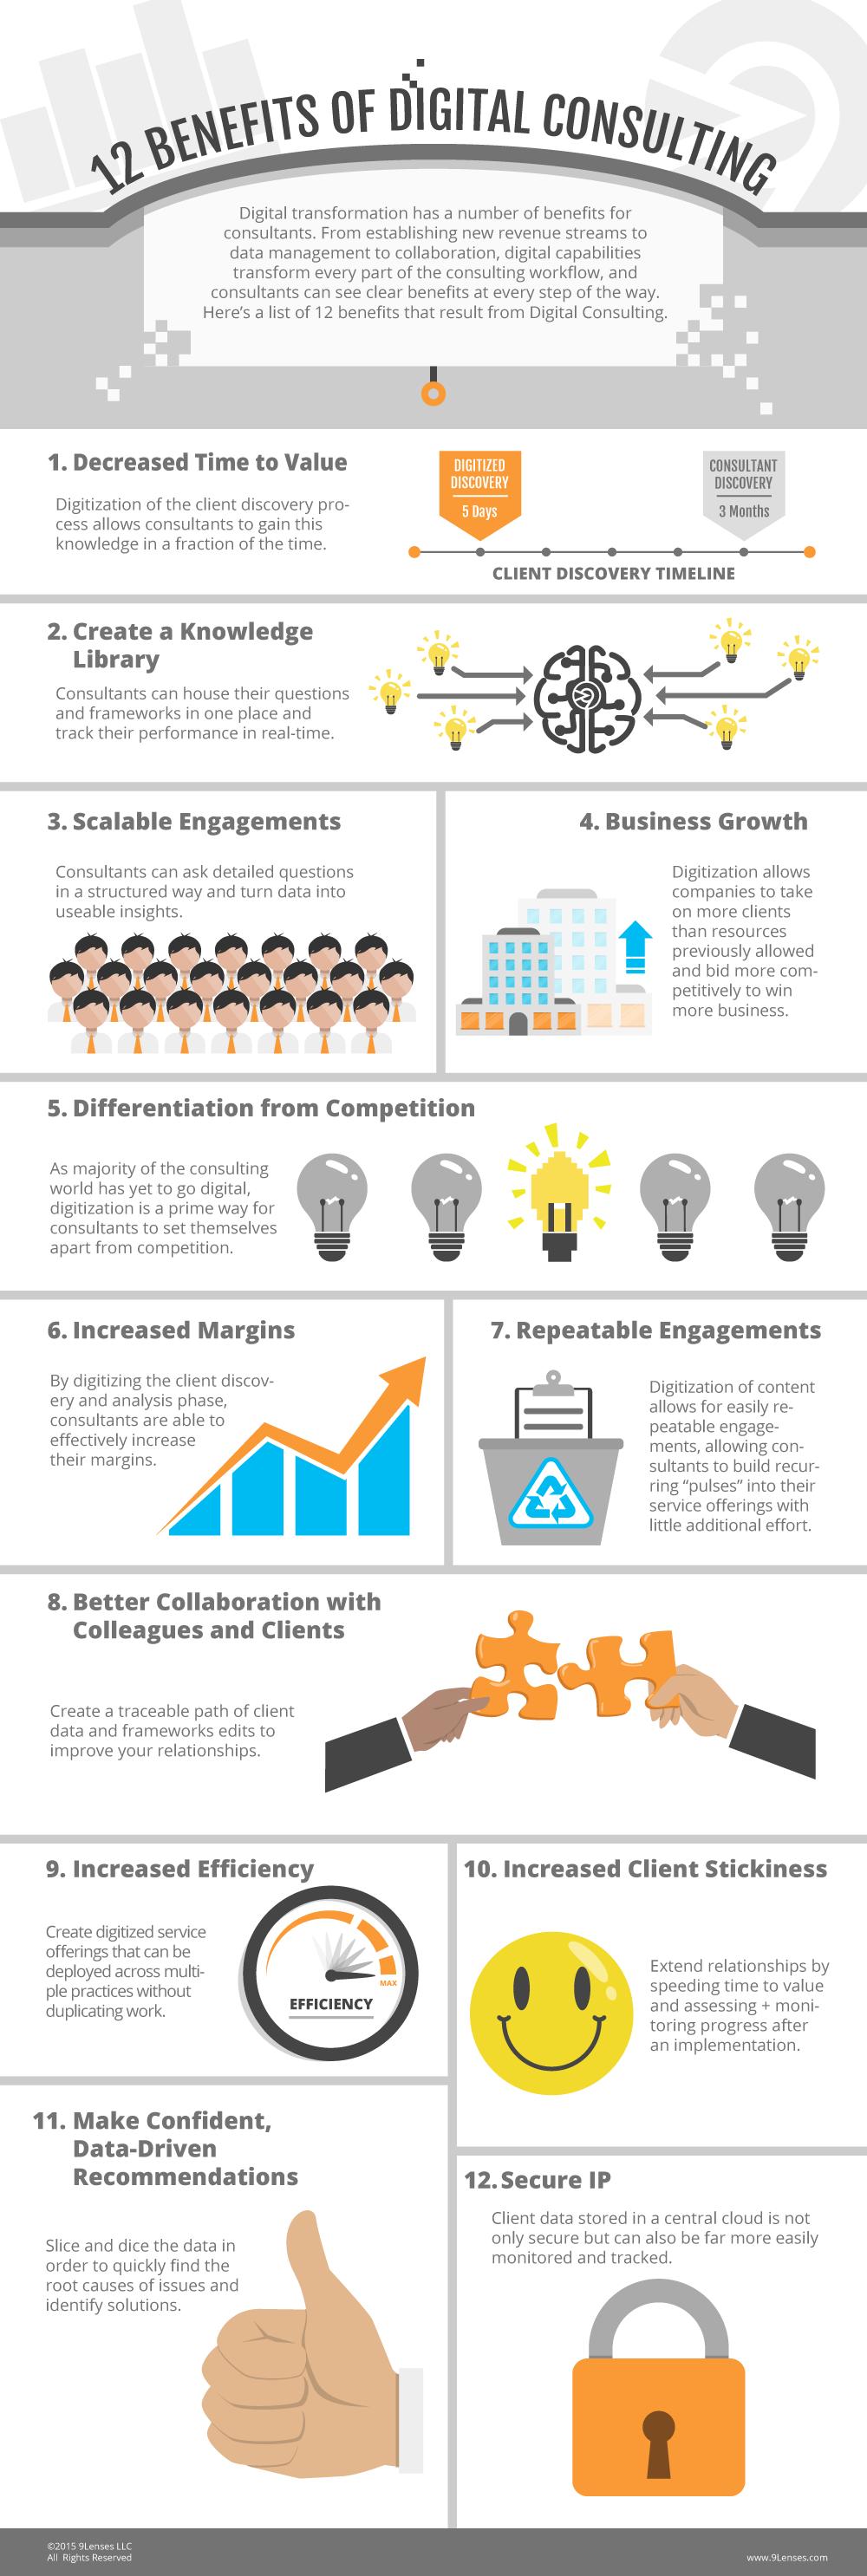 12-Digital_Consulting_Benefts_UPDATED v.2